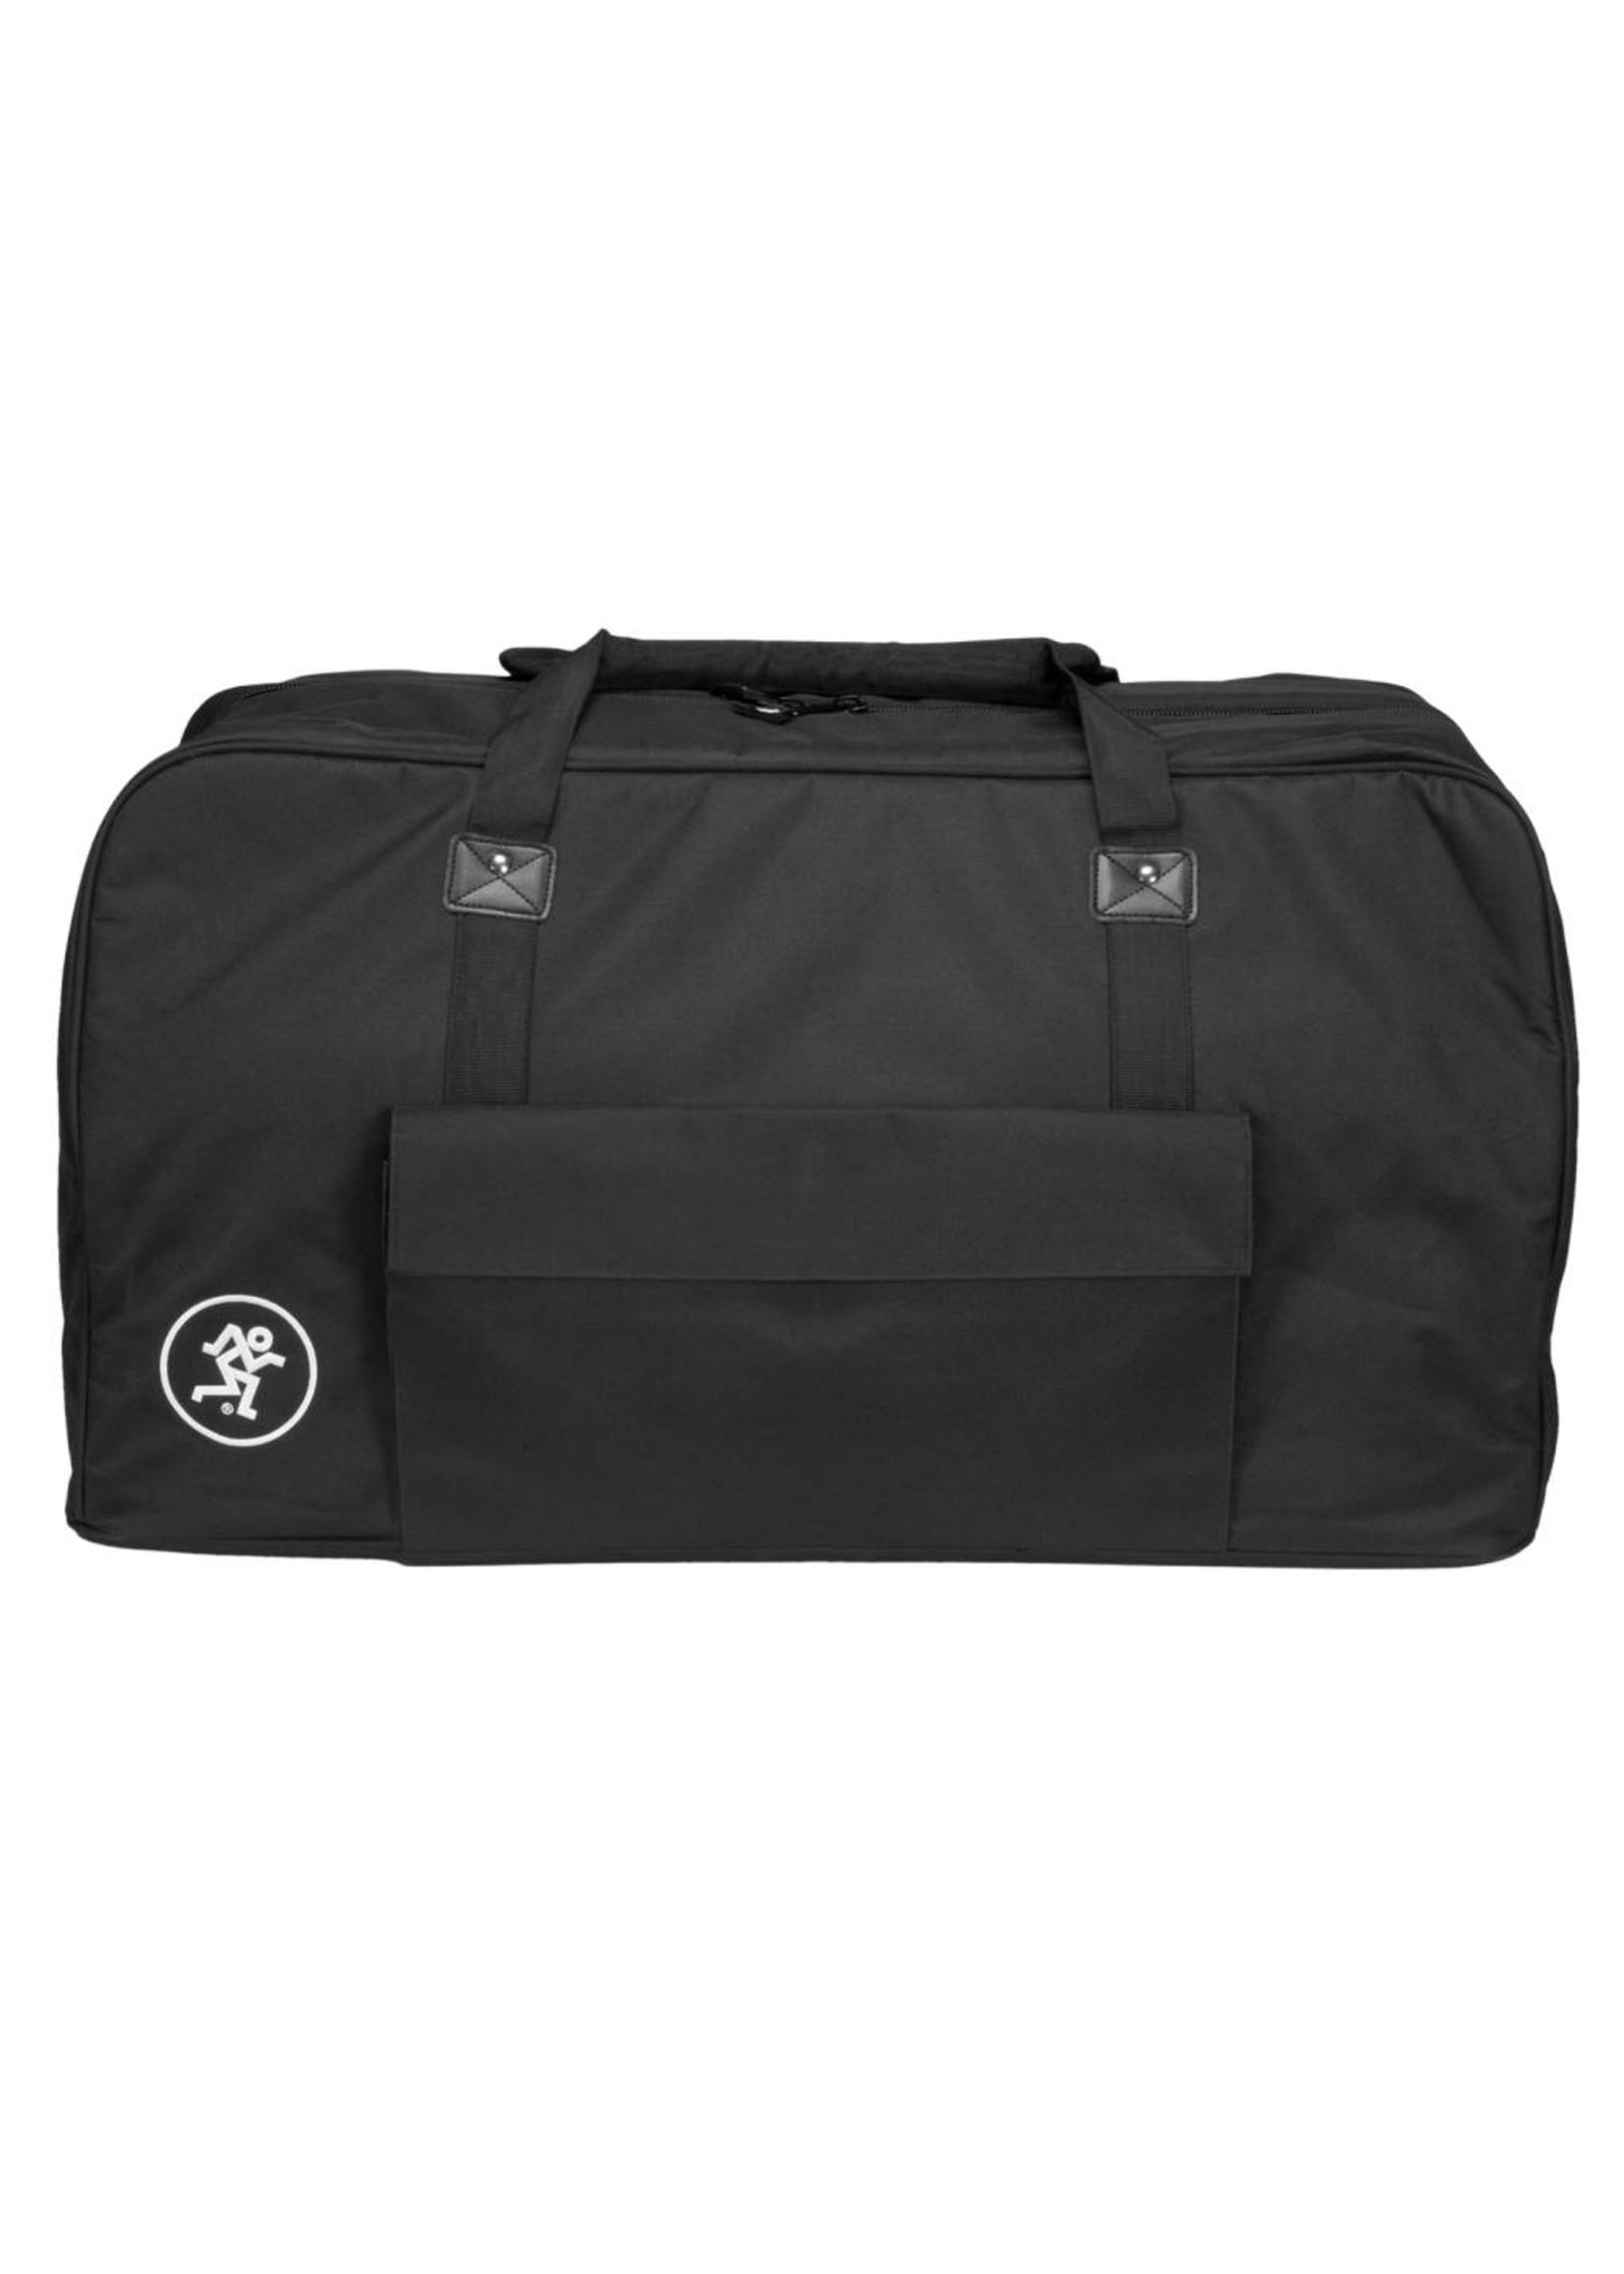 MACKIE BAG THUMP15A/BST MACKIE